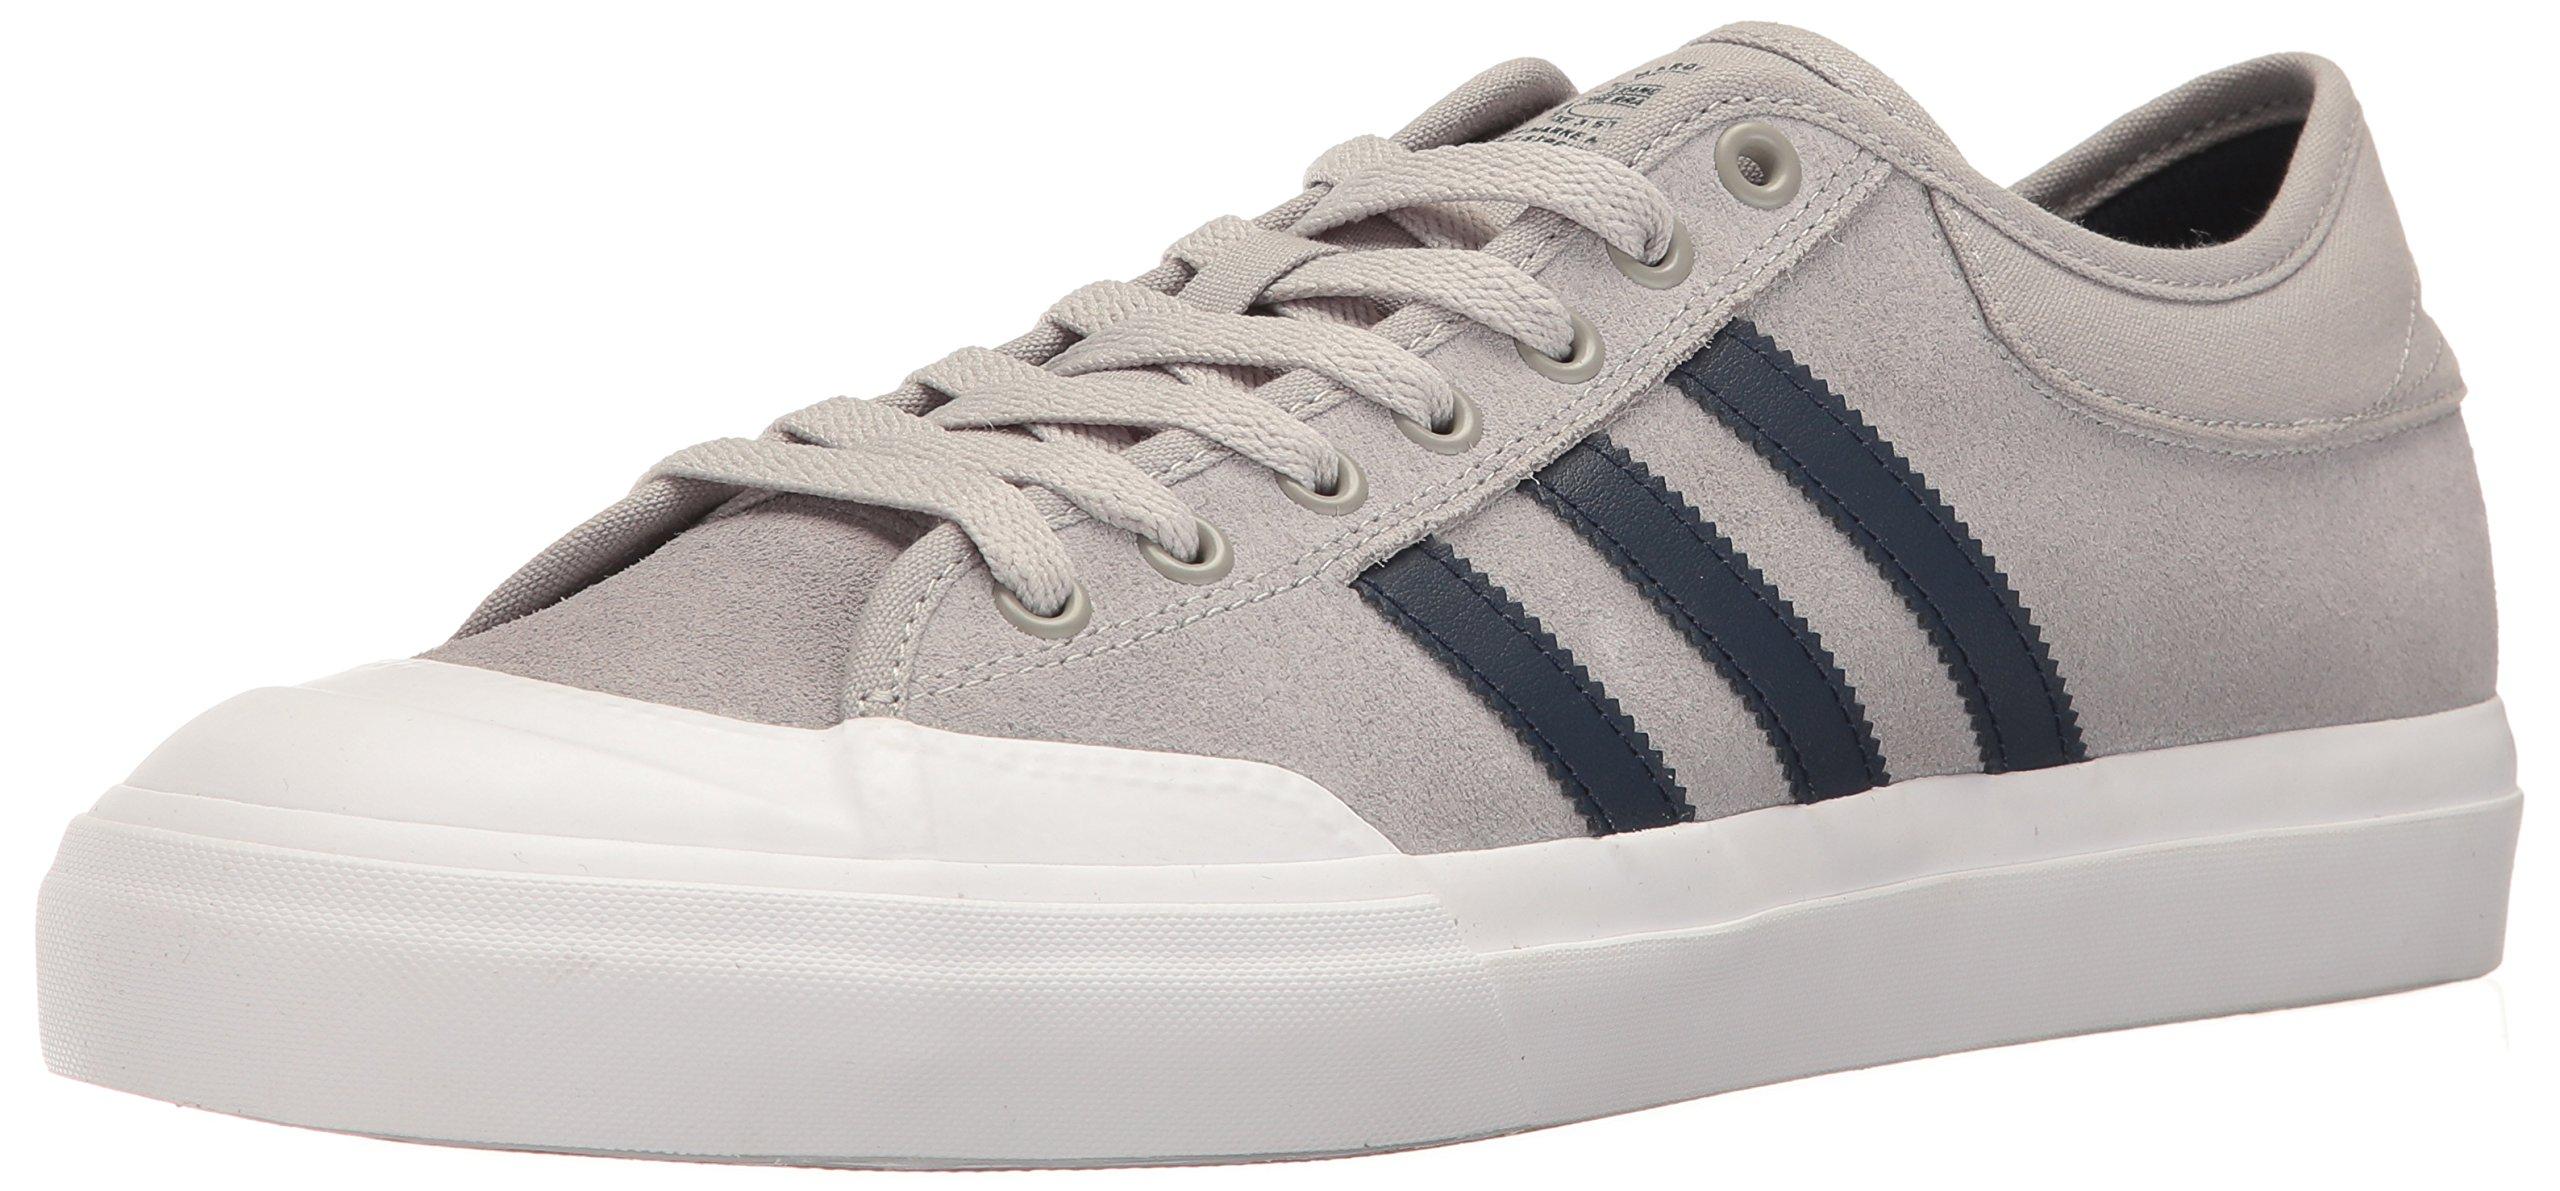 Hombre rico Reprimir Relativo  Adidas Matchcourt ADV Grey/Navy/White Skate Shoes-Men 8.0, Women 9.5 on  Galleon Philippines